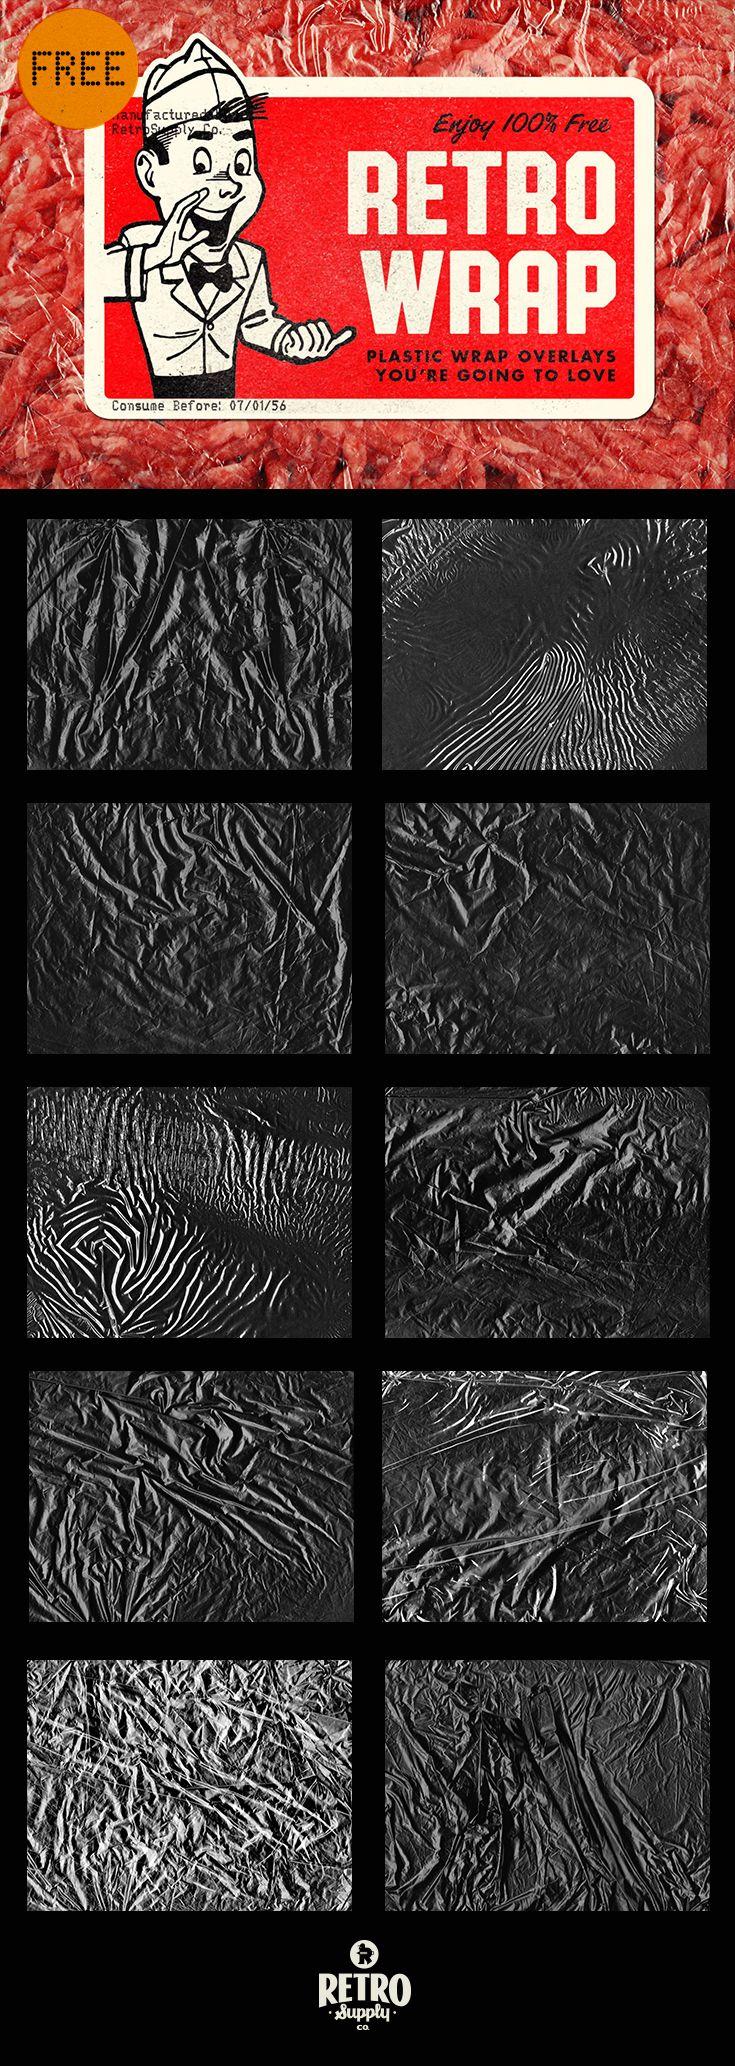 artistic overlay Photoshop layers designer/'s tool Splash1 inspiring backgrounds artist/'s tool textures instant digital download